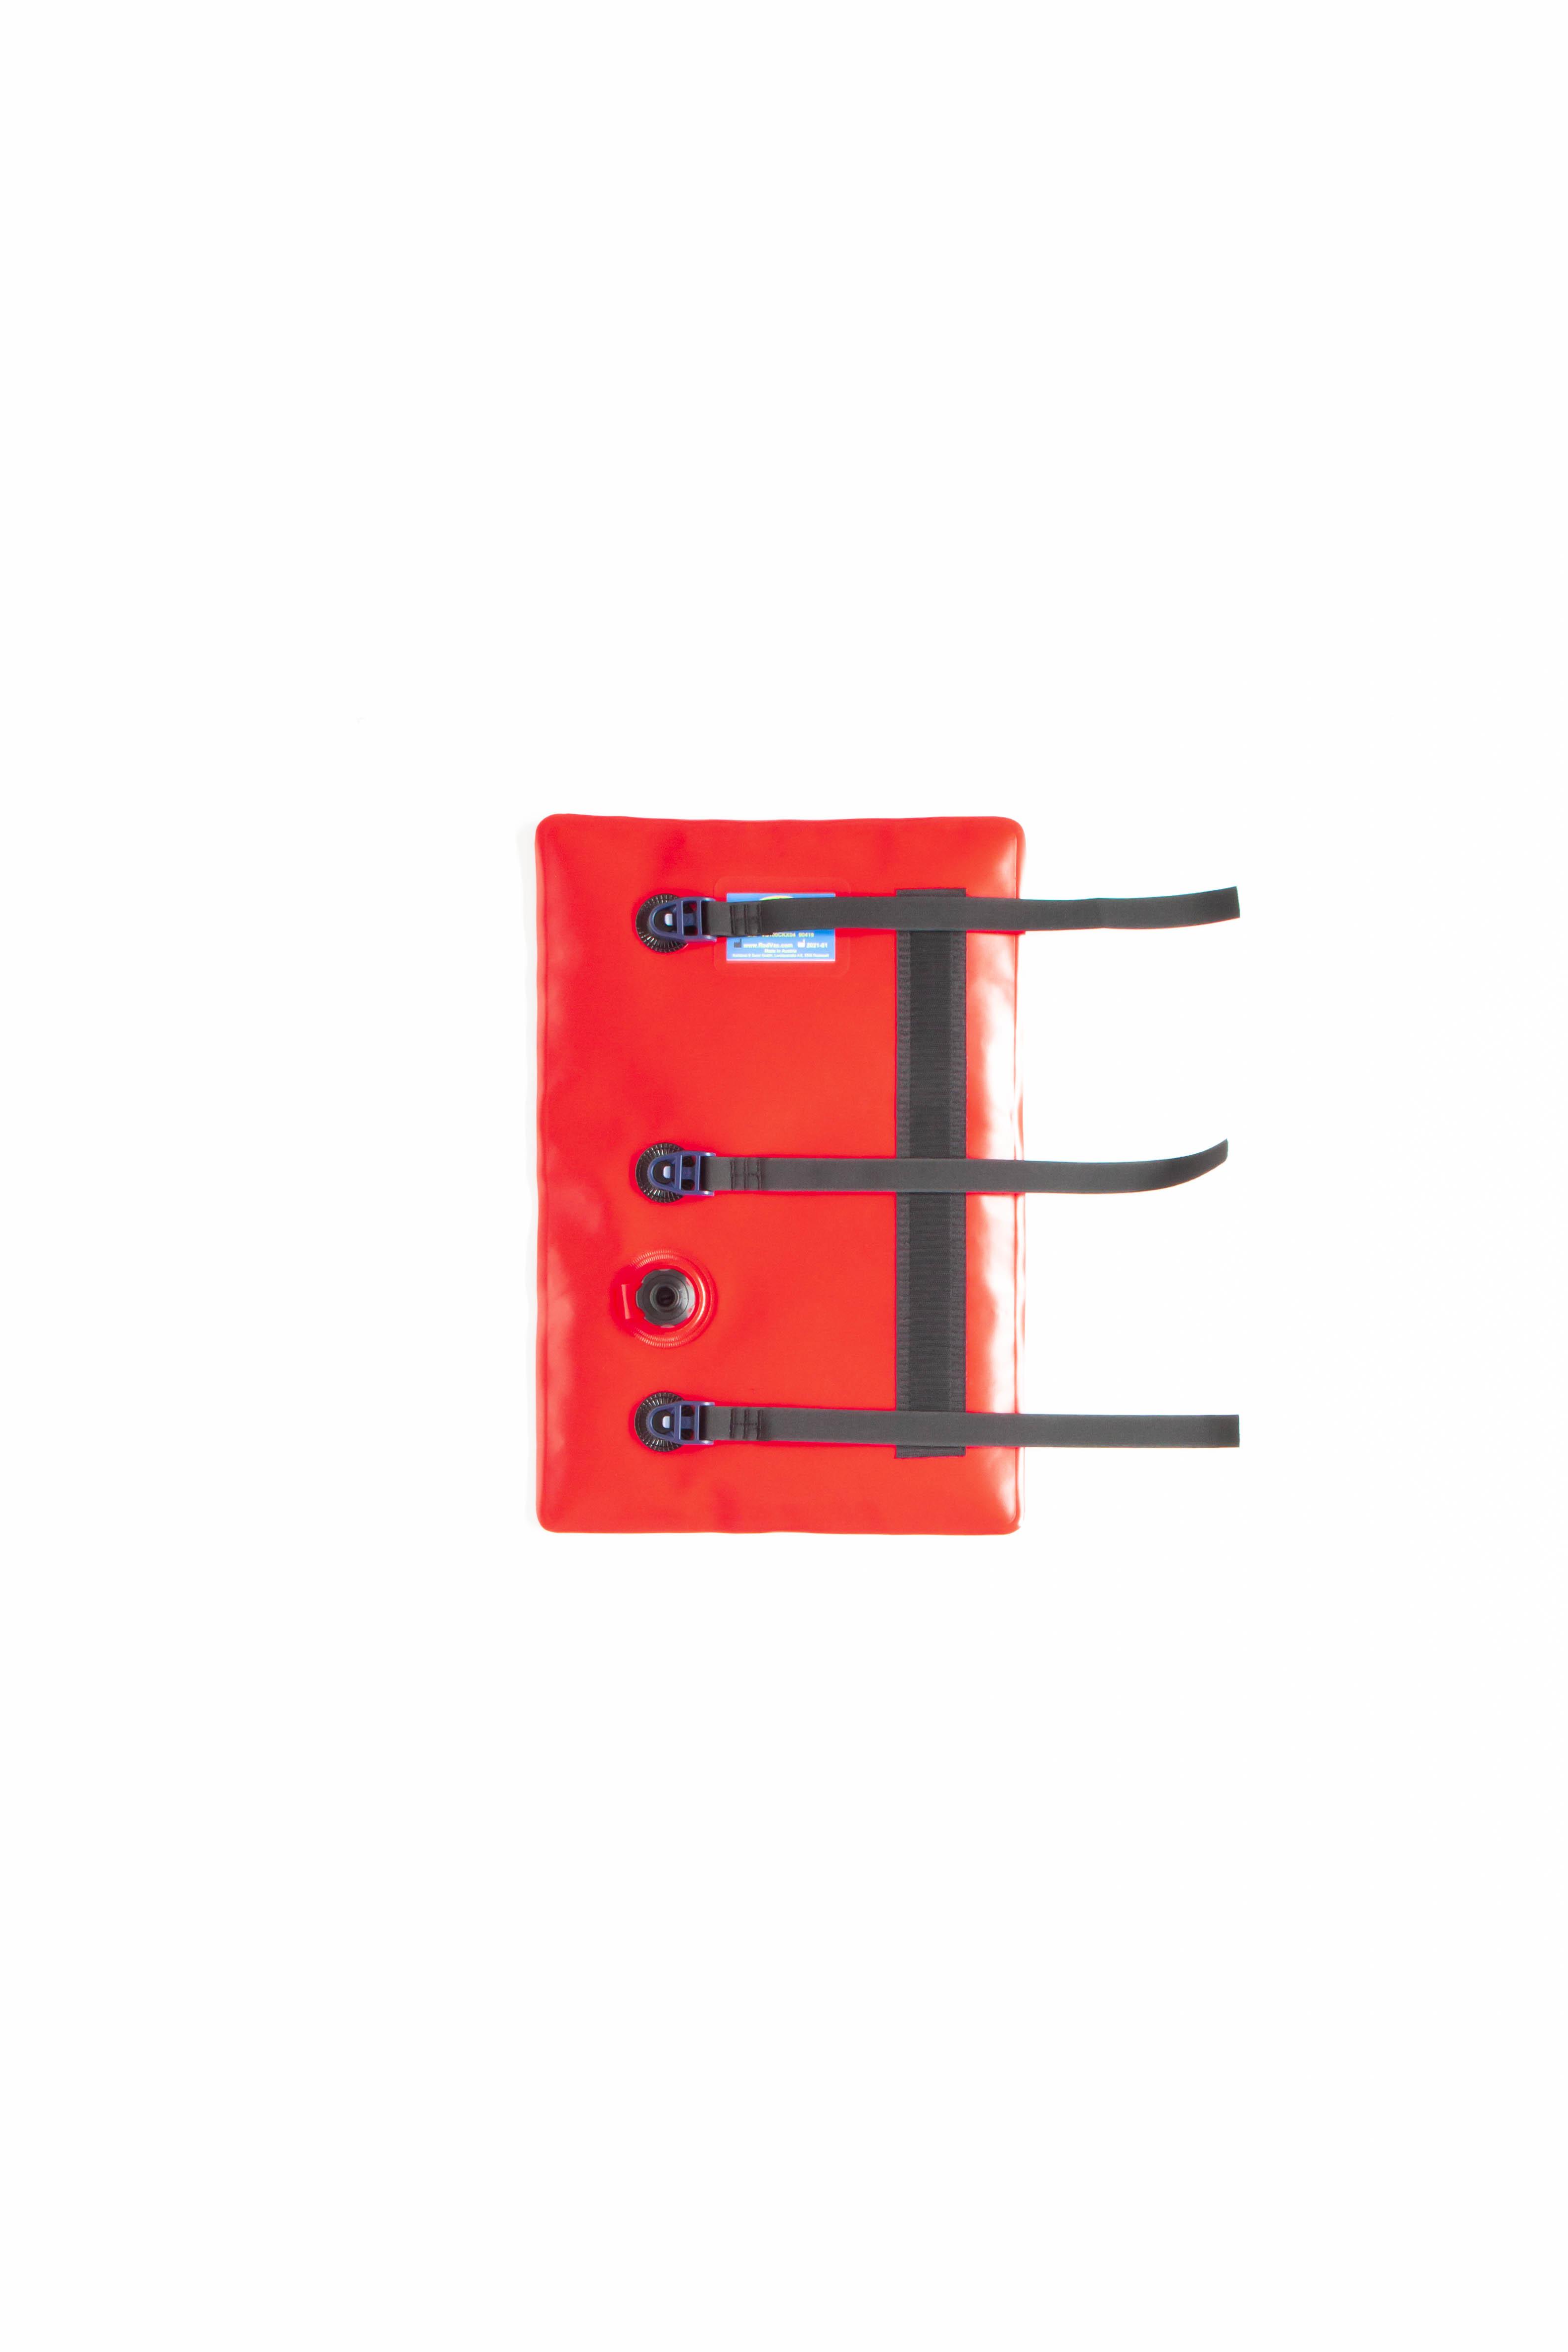 RedVac vacuumspalk voorarm 35 x 42 cm